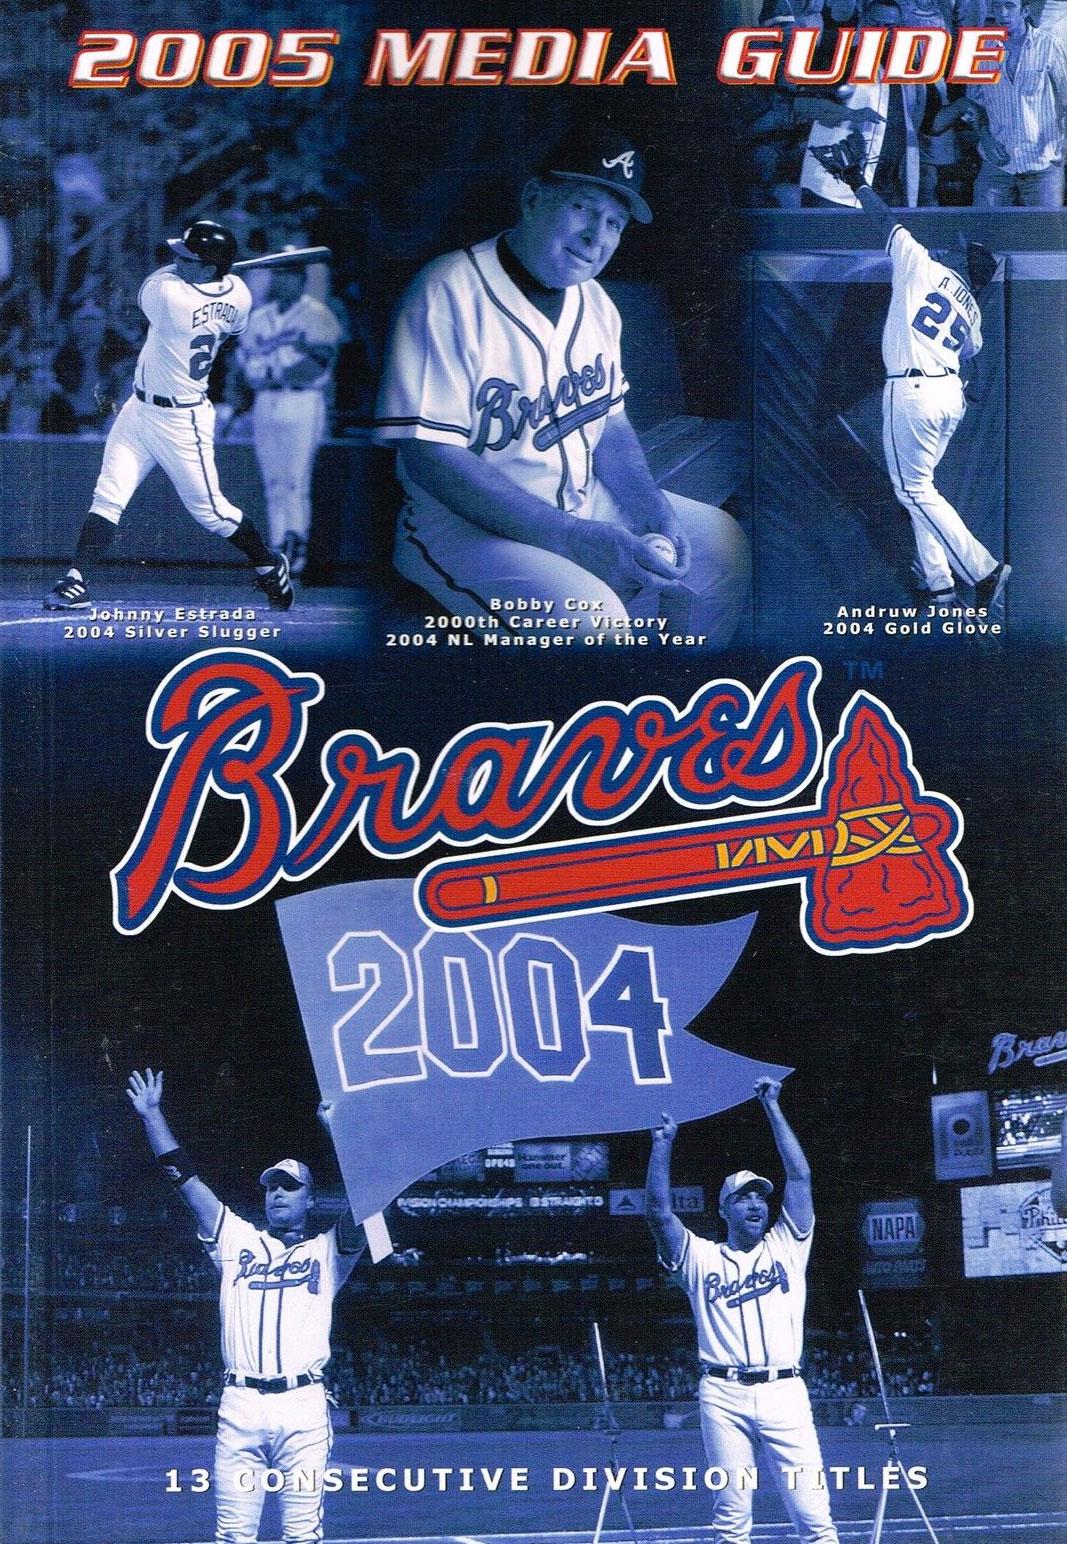 Atlanta Braves Media Guide Media Guide (2005) -  SportsLogos.Net